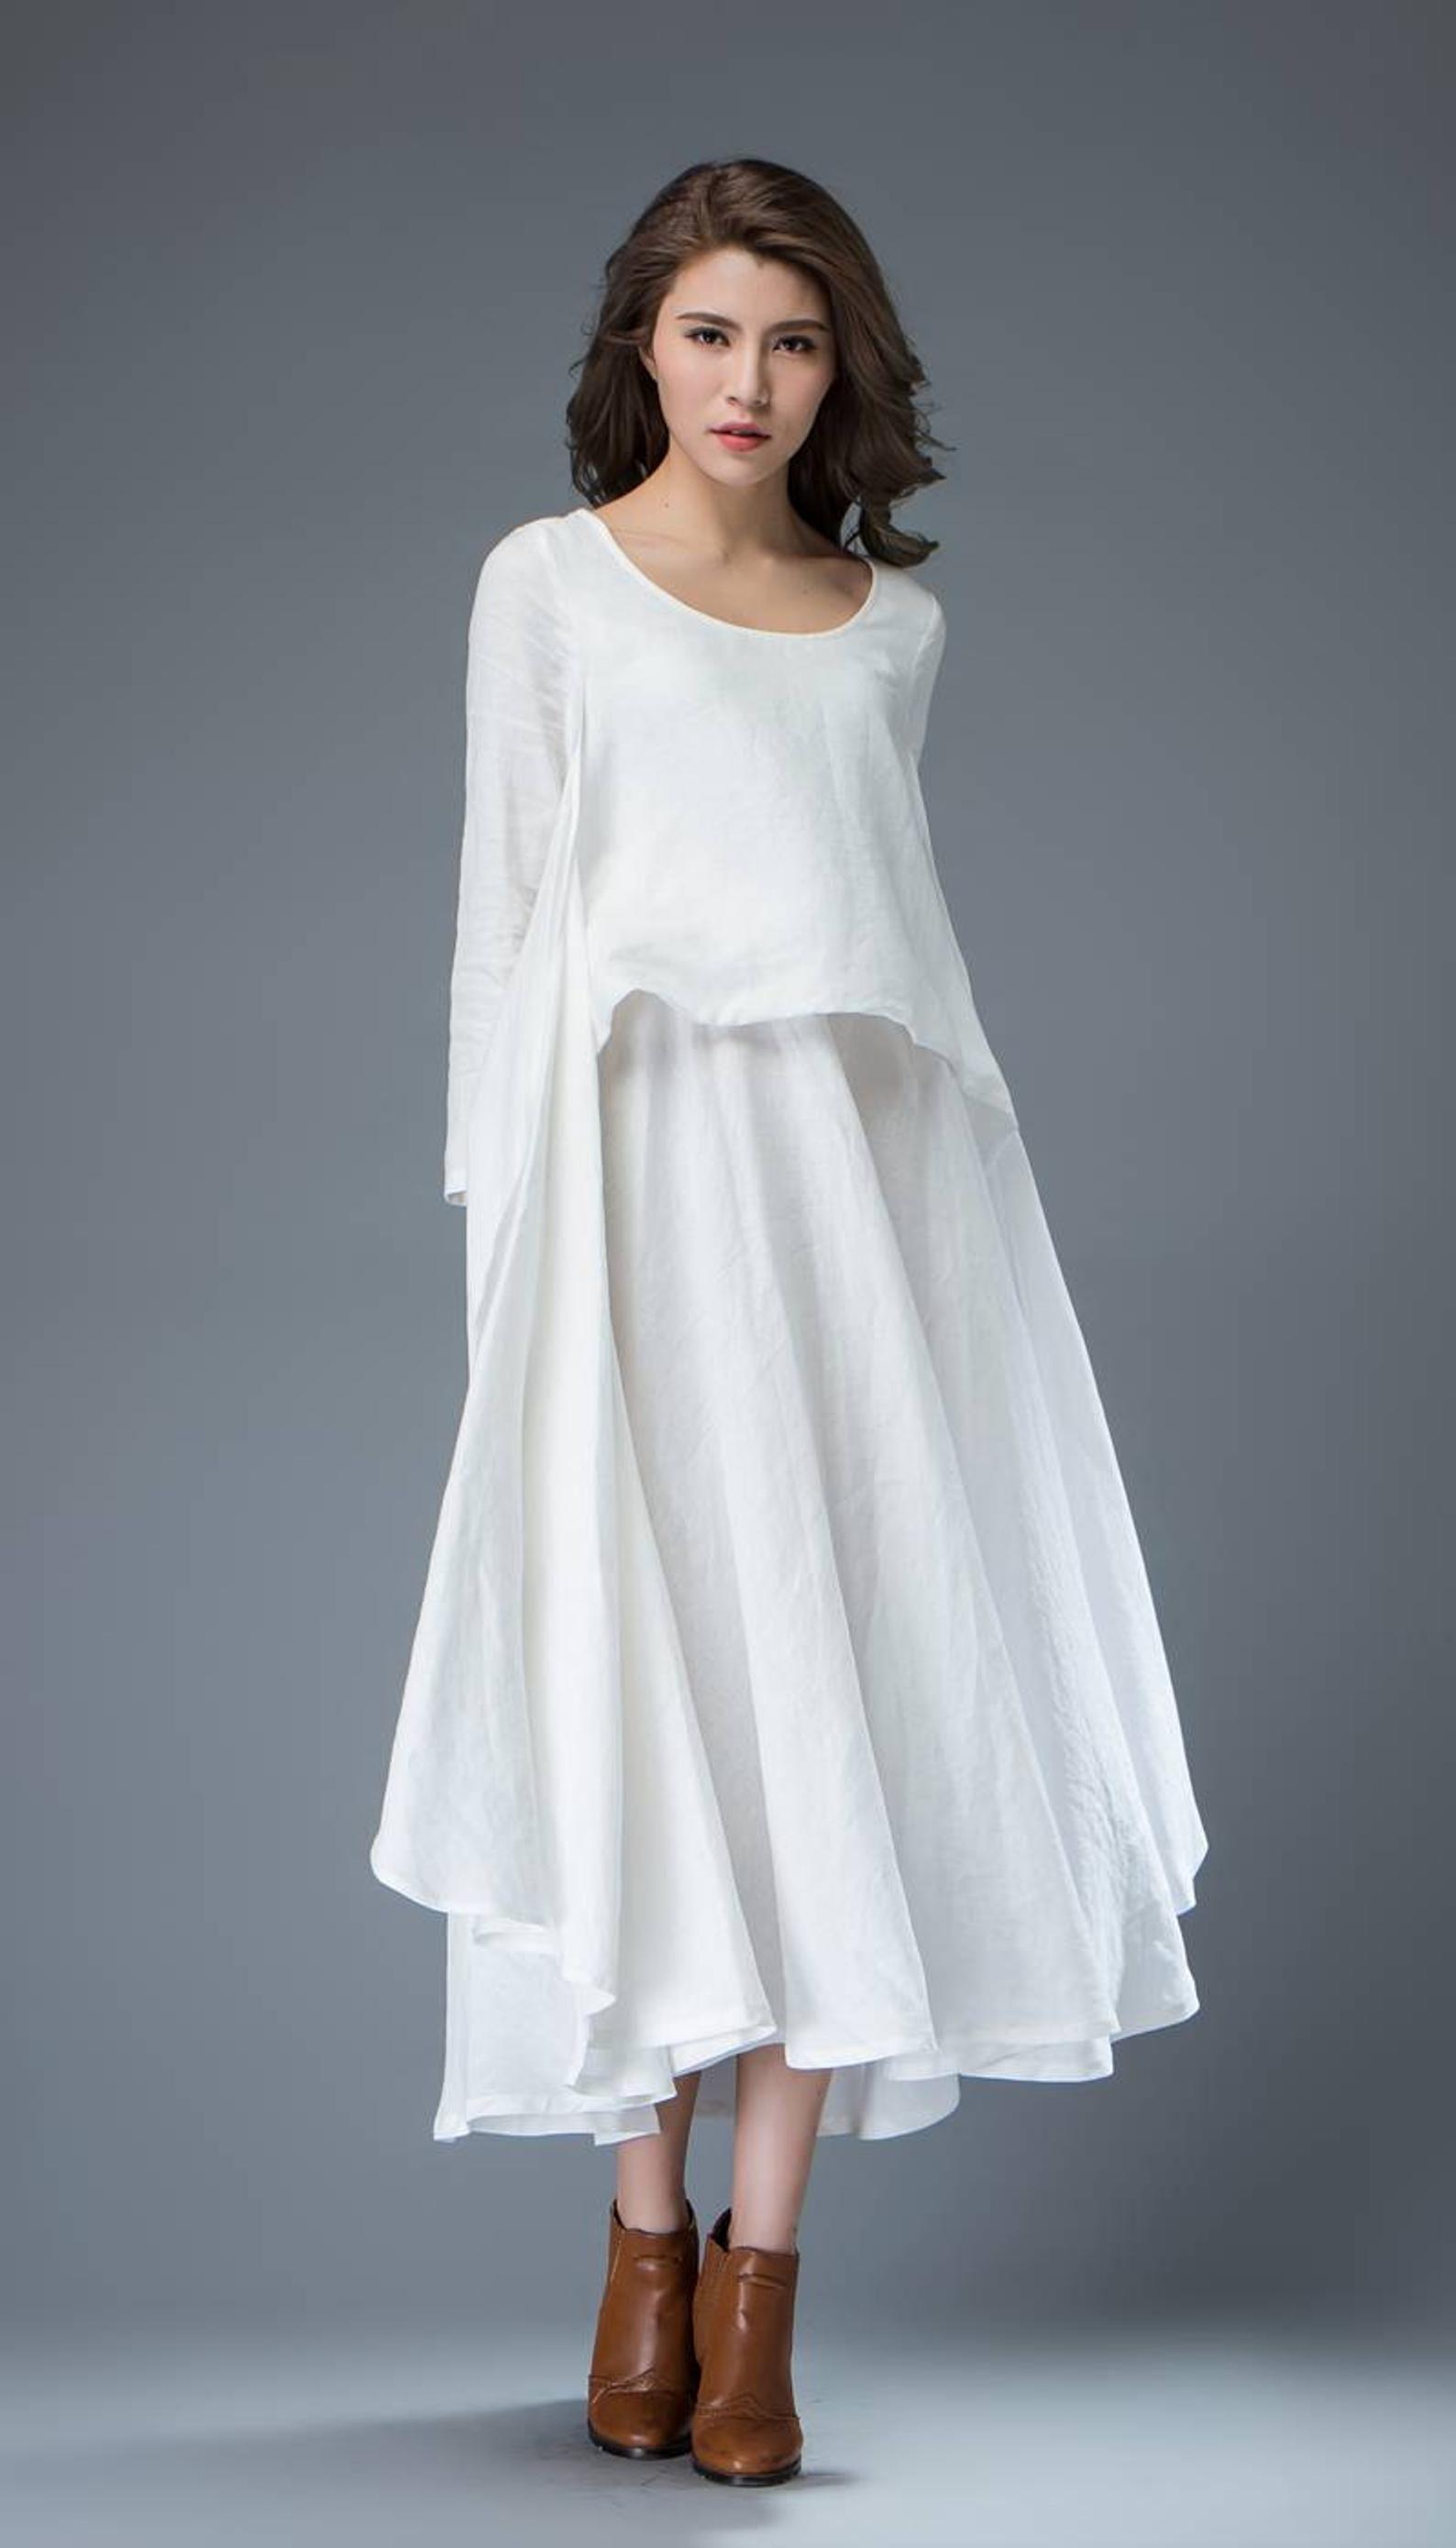 White Linen Dress Long Sleeve Dress Linen Dress Womens Etsy Gaun Linen Model Pakaian Model Pakaian Hijab [ 2779 x 1588 Pixel ]